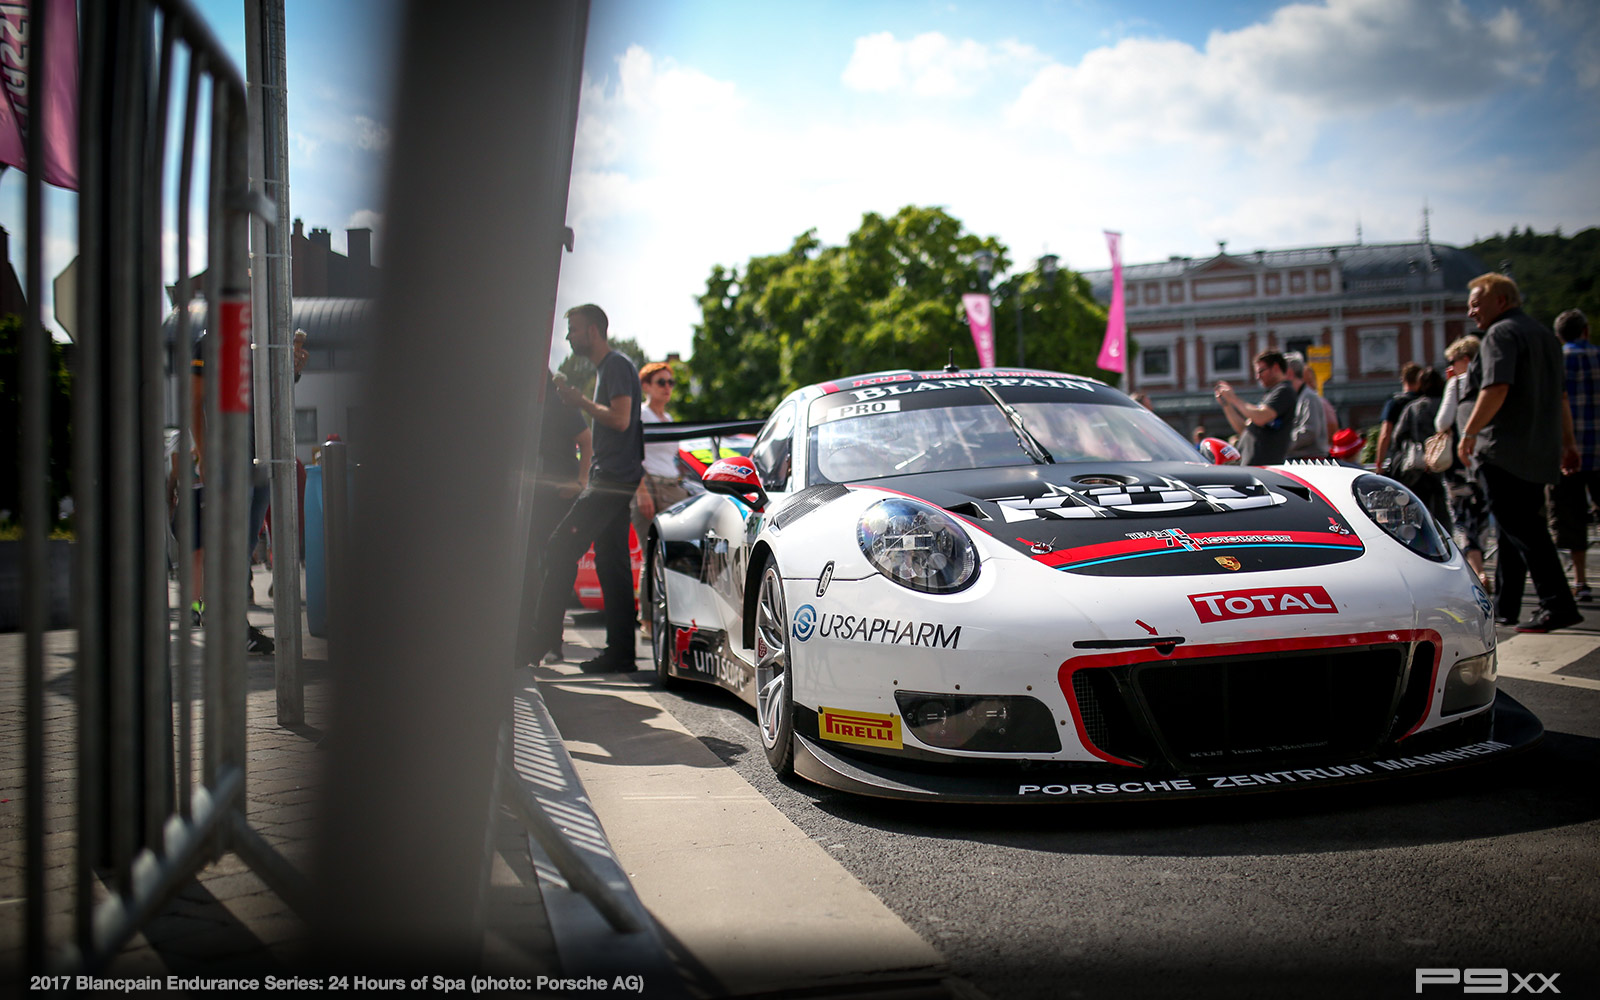 2017-24-Hours-of-Spa-Porsche-304